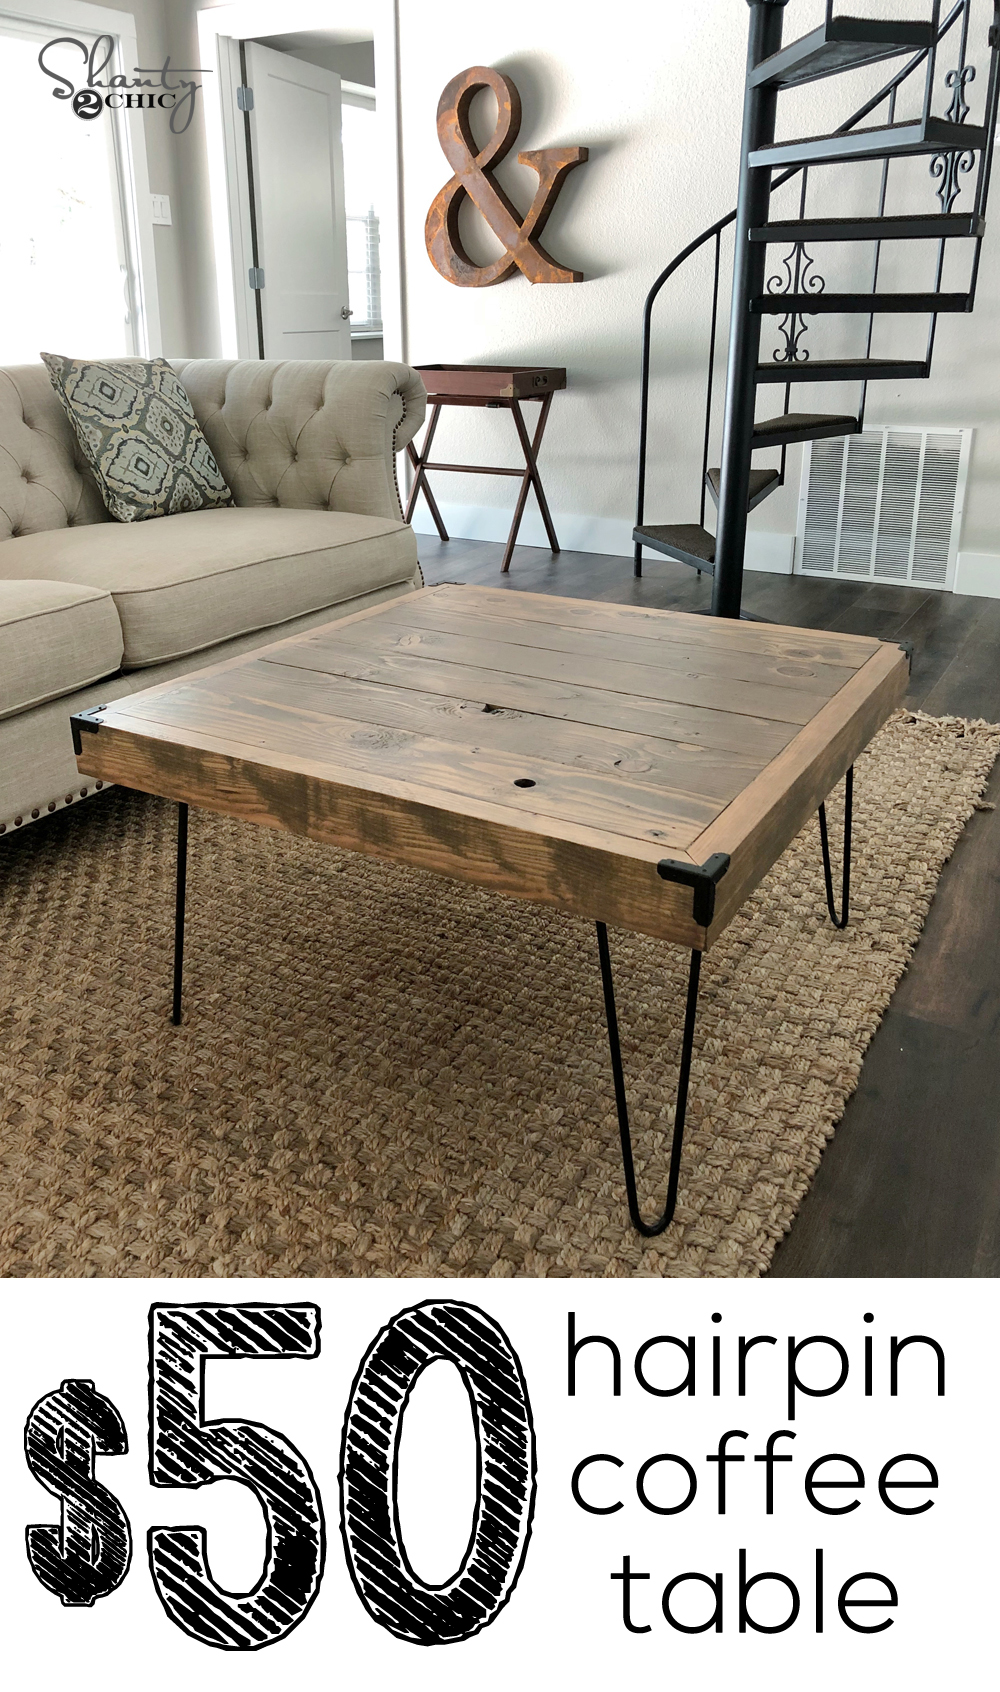 Diy 50 Square Hairpin Leg Coffee Table Shanty 2 Chic